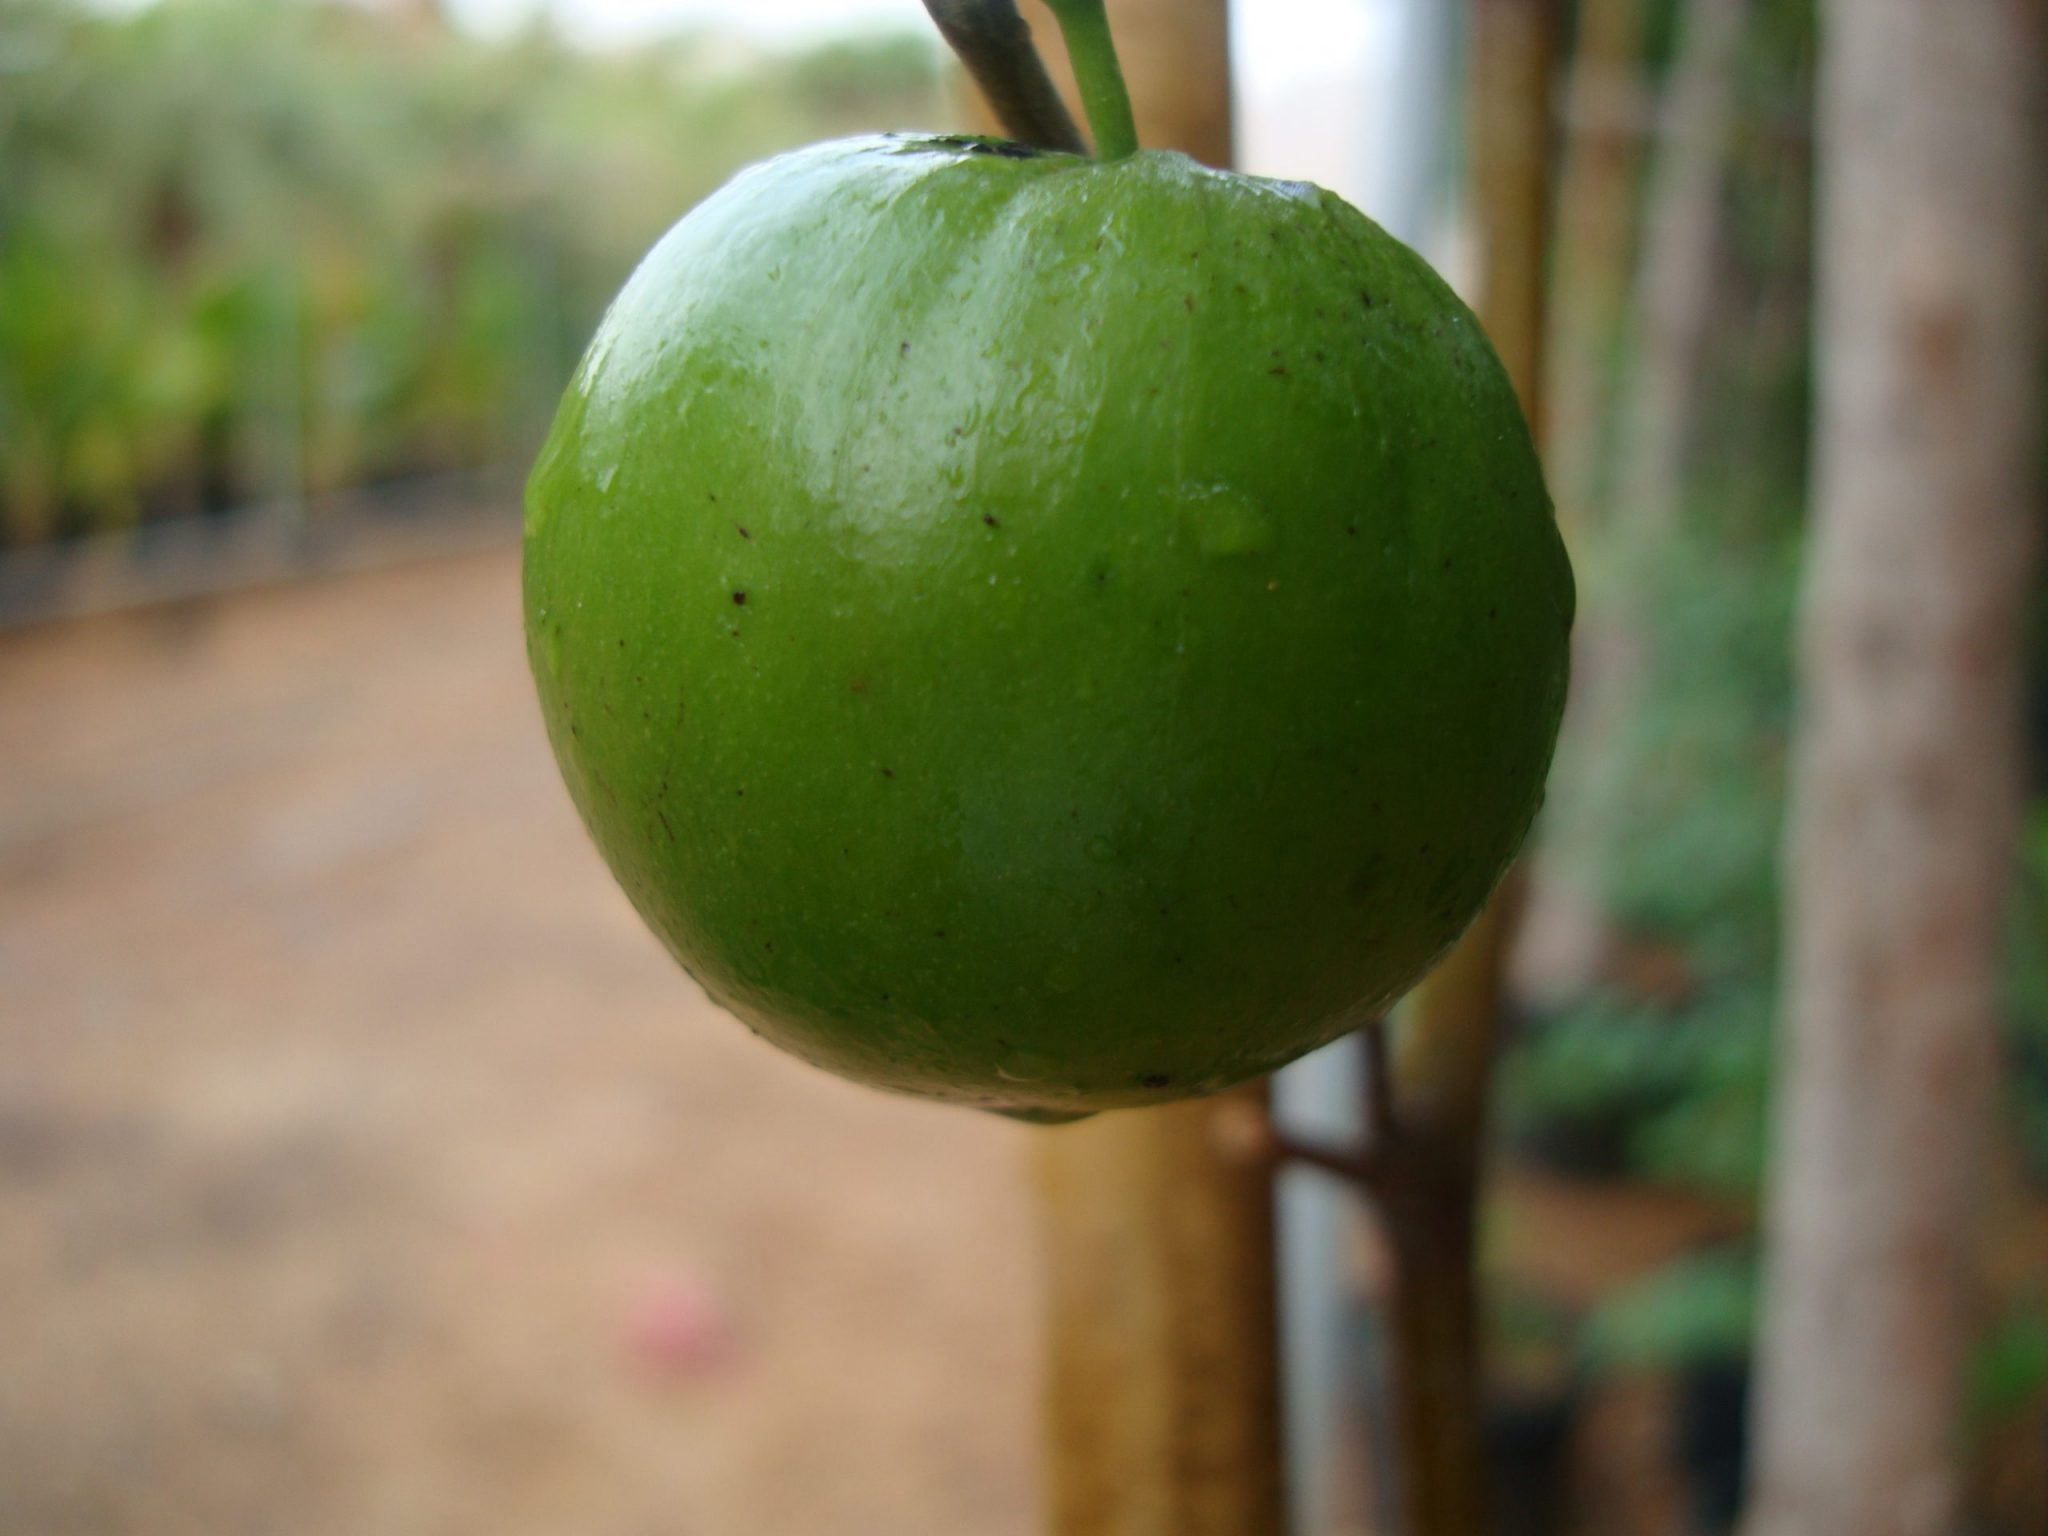 Ziziphus jujuba Or Jujube Tree شجرة عناب